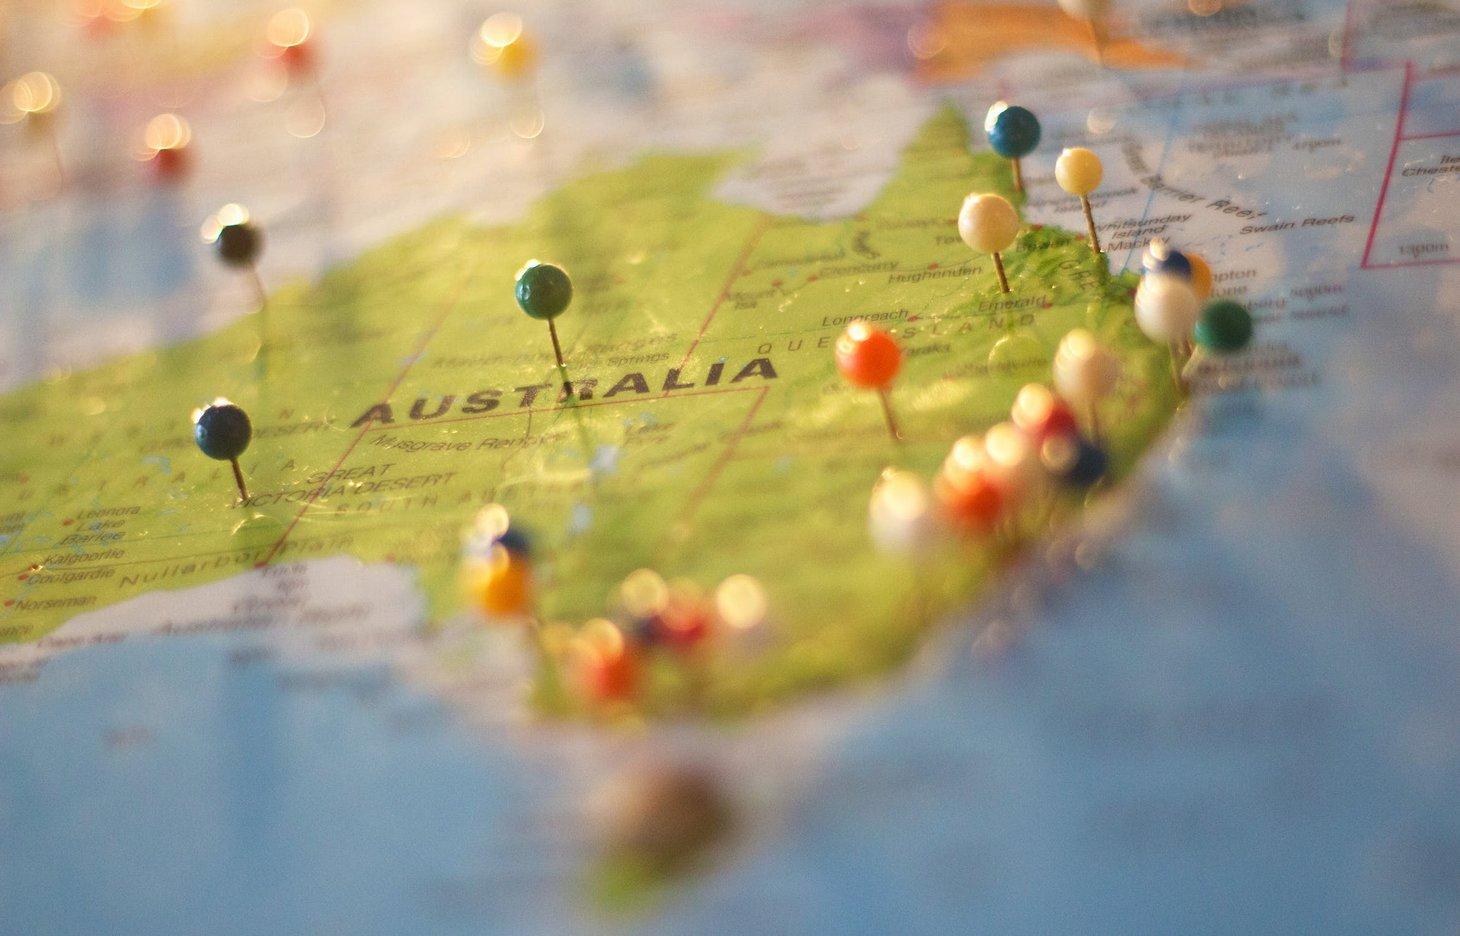 Ma of Australia for climate sensitive design